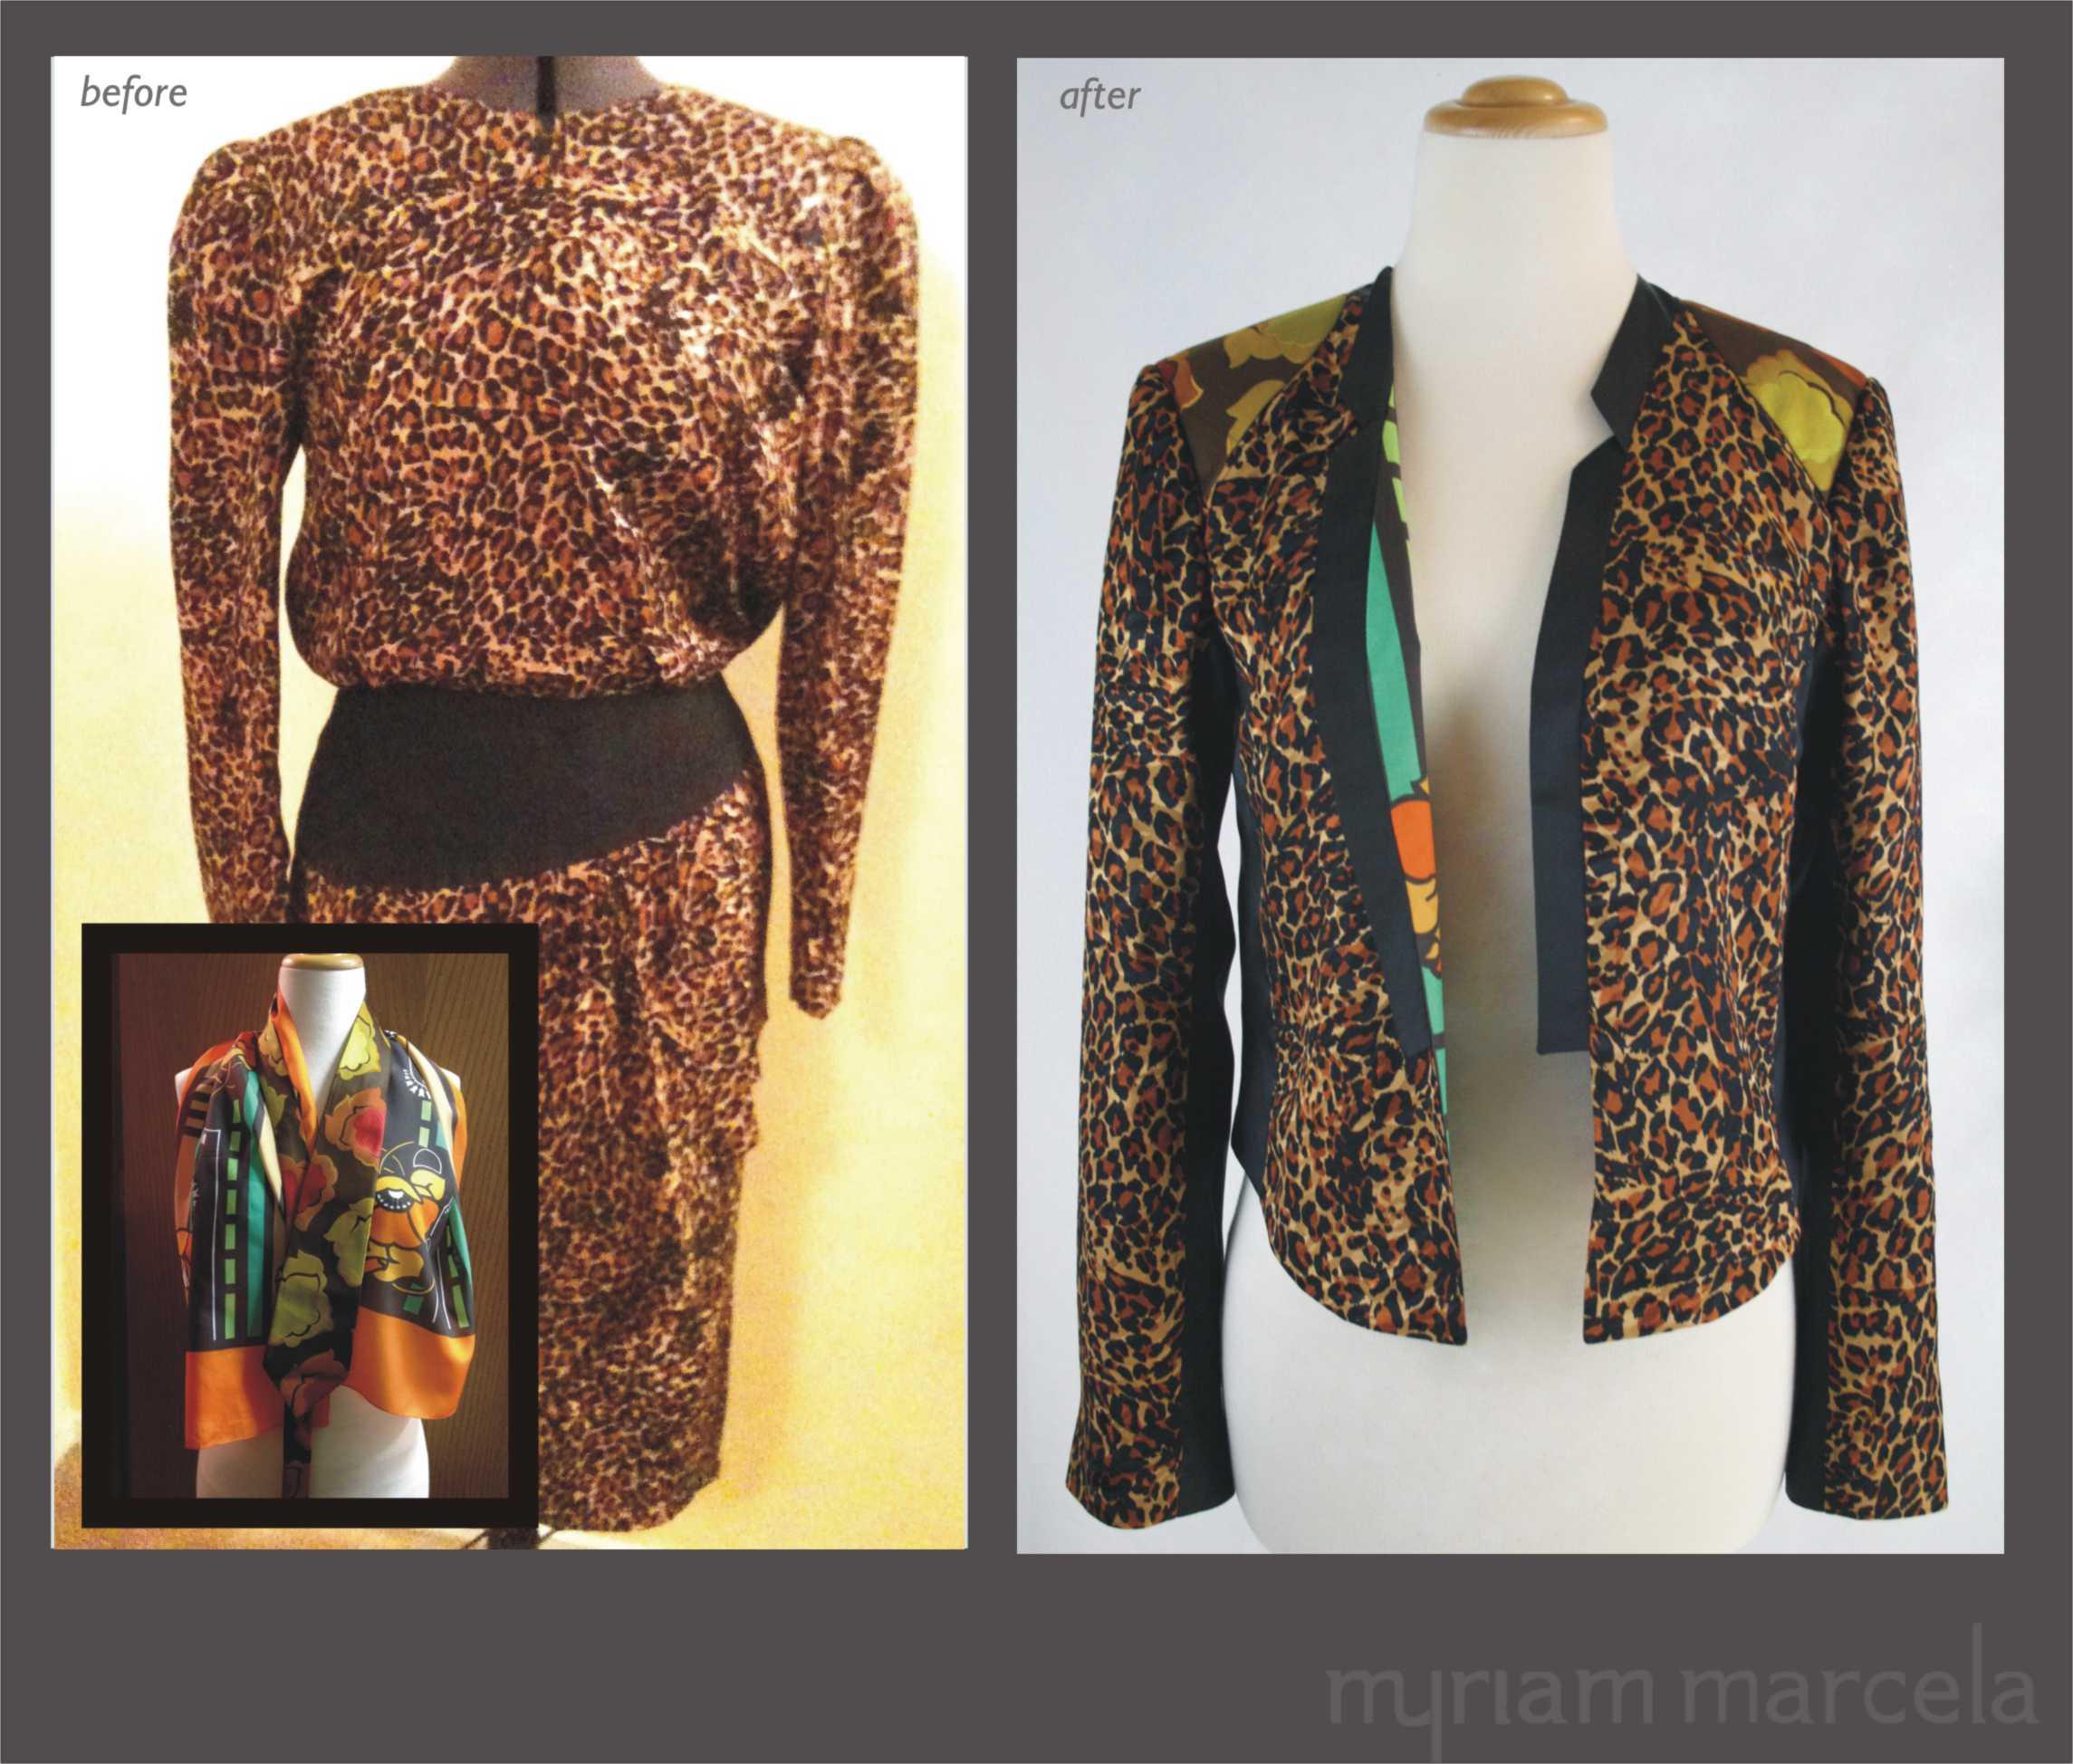 Sam Leopard Jacket.jpg